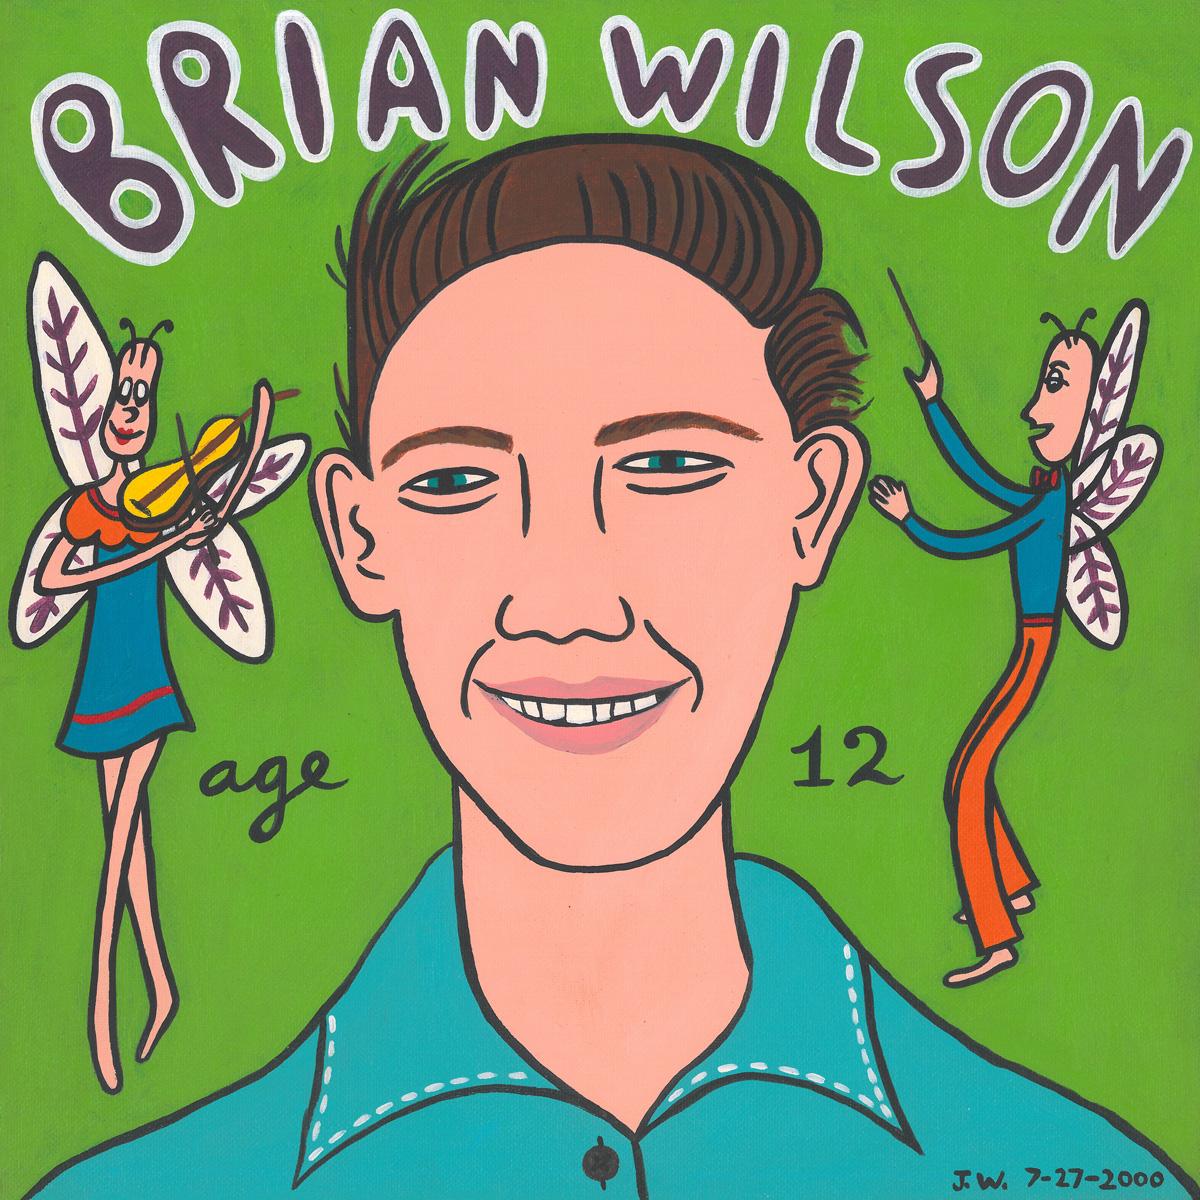 Brian Wilson 12x12 Painting.jpg